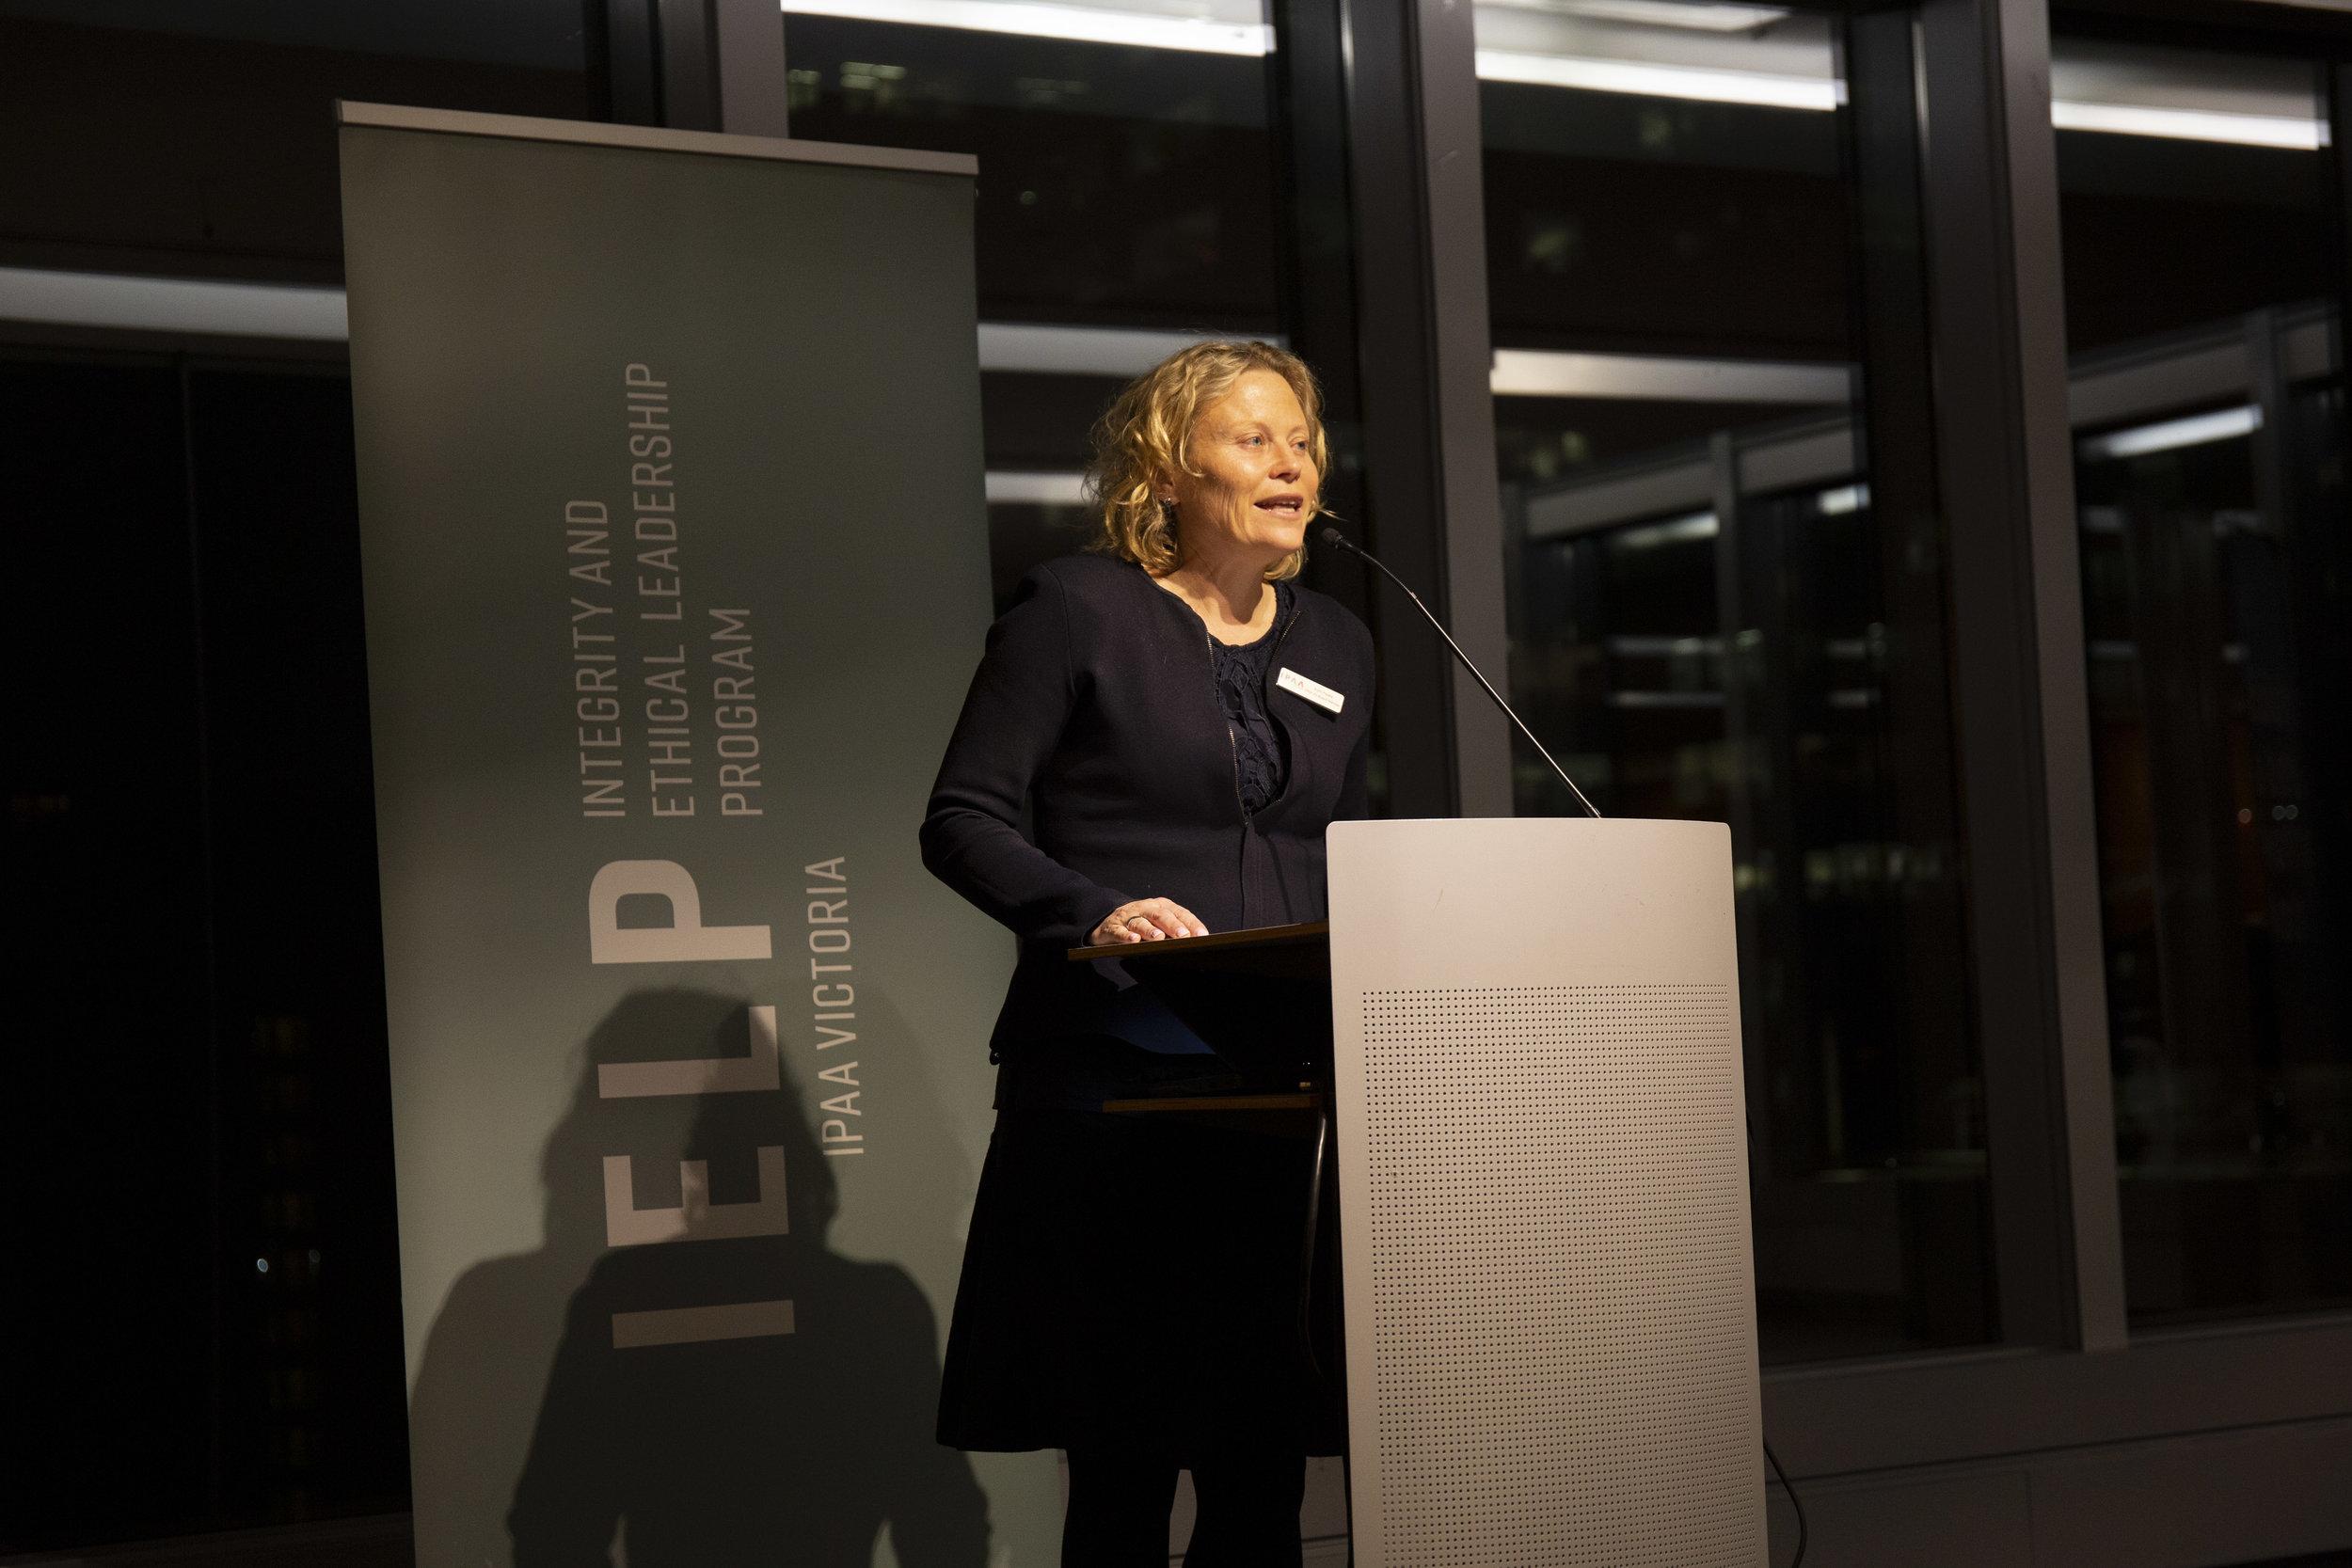 Kym Peake, IPAA Victoria president, addresses guests and alumni